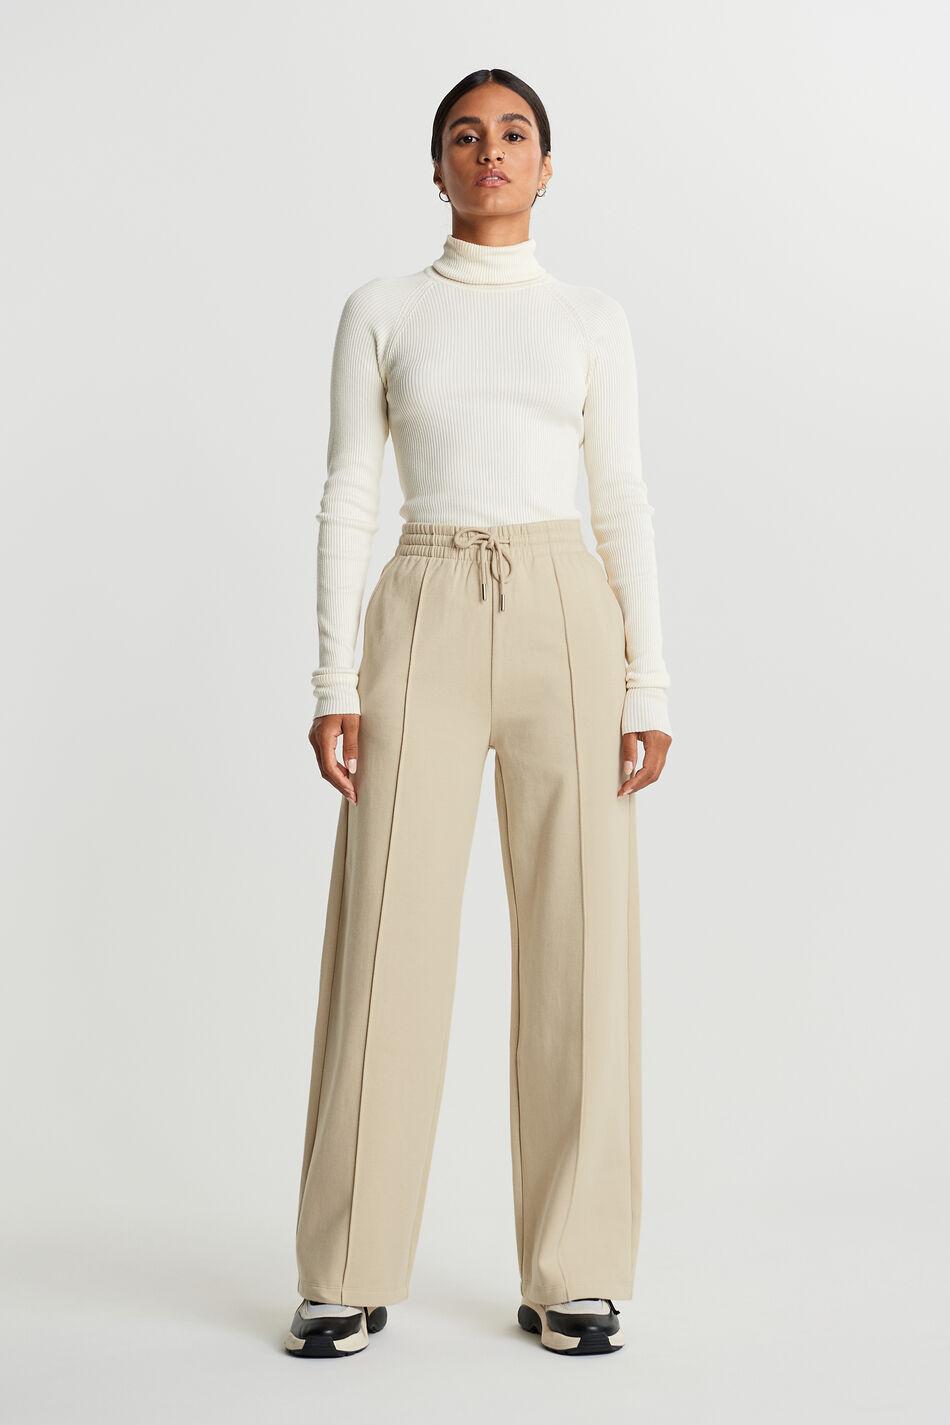 Gina Tricot Bonnie sweatpants M Female Brown rice (7316)